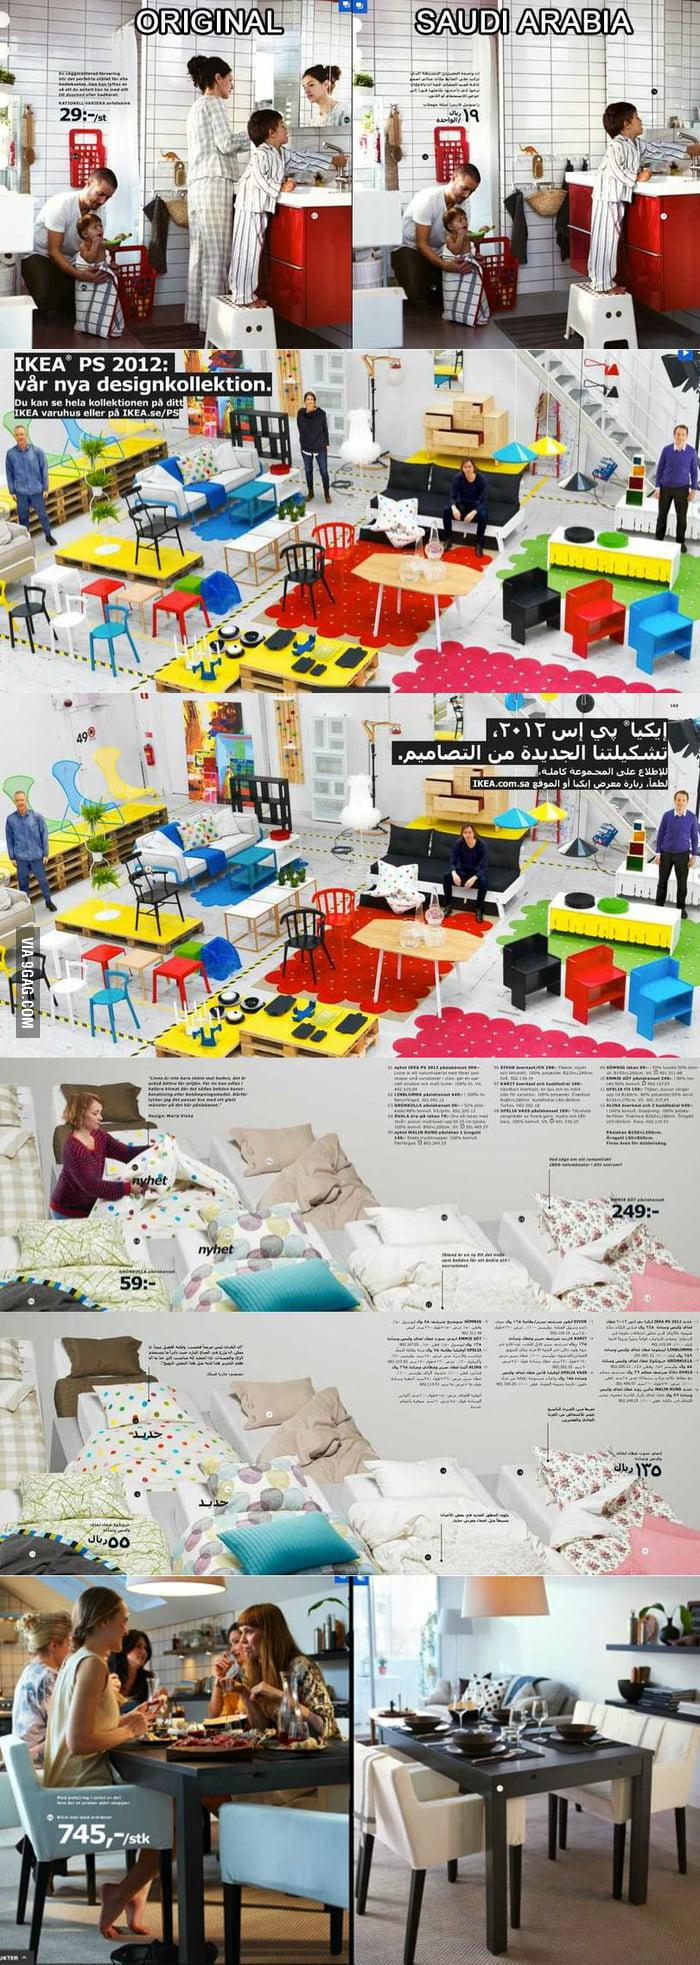 IKEA removes women from 2012 Saudi Arabian IKEA catalog